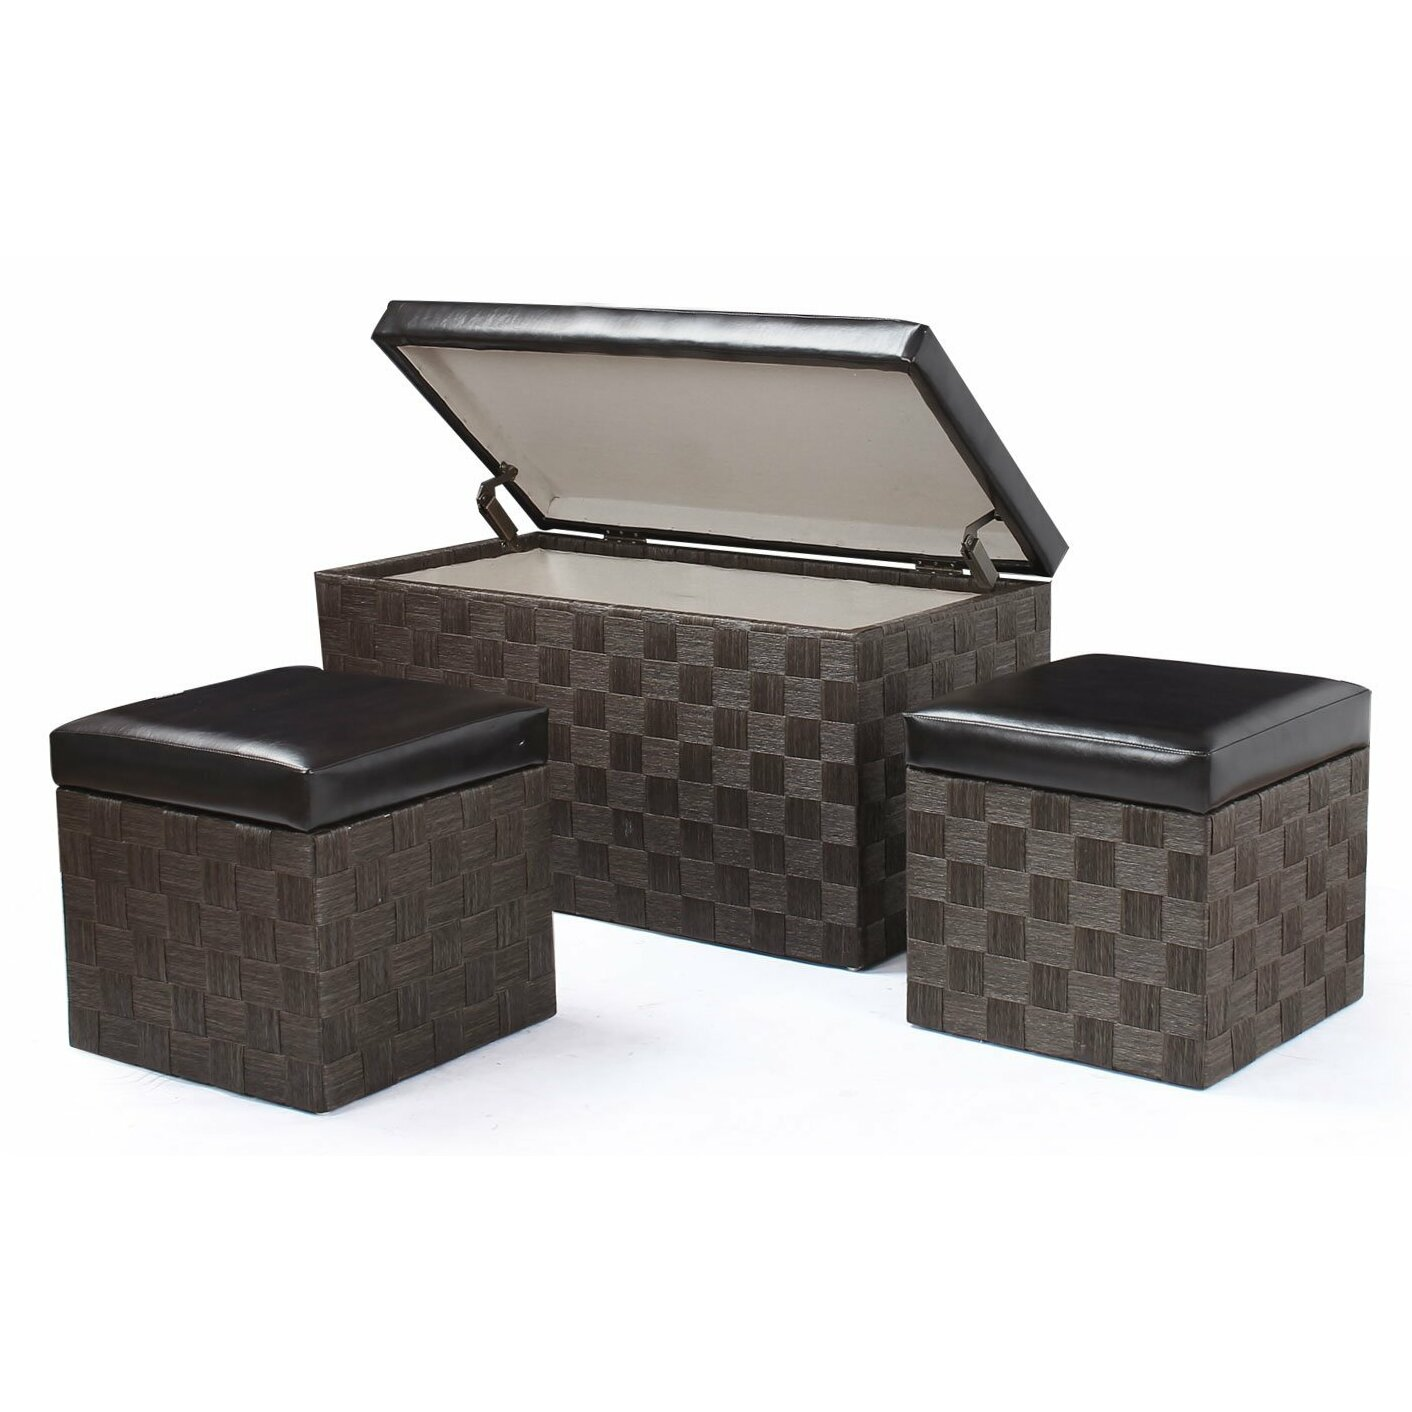 Adecotrading piece storage ottoman set reviews wayfair